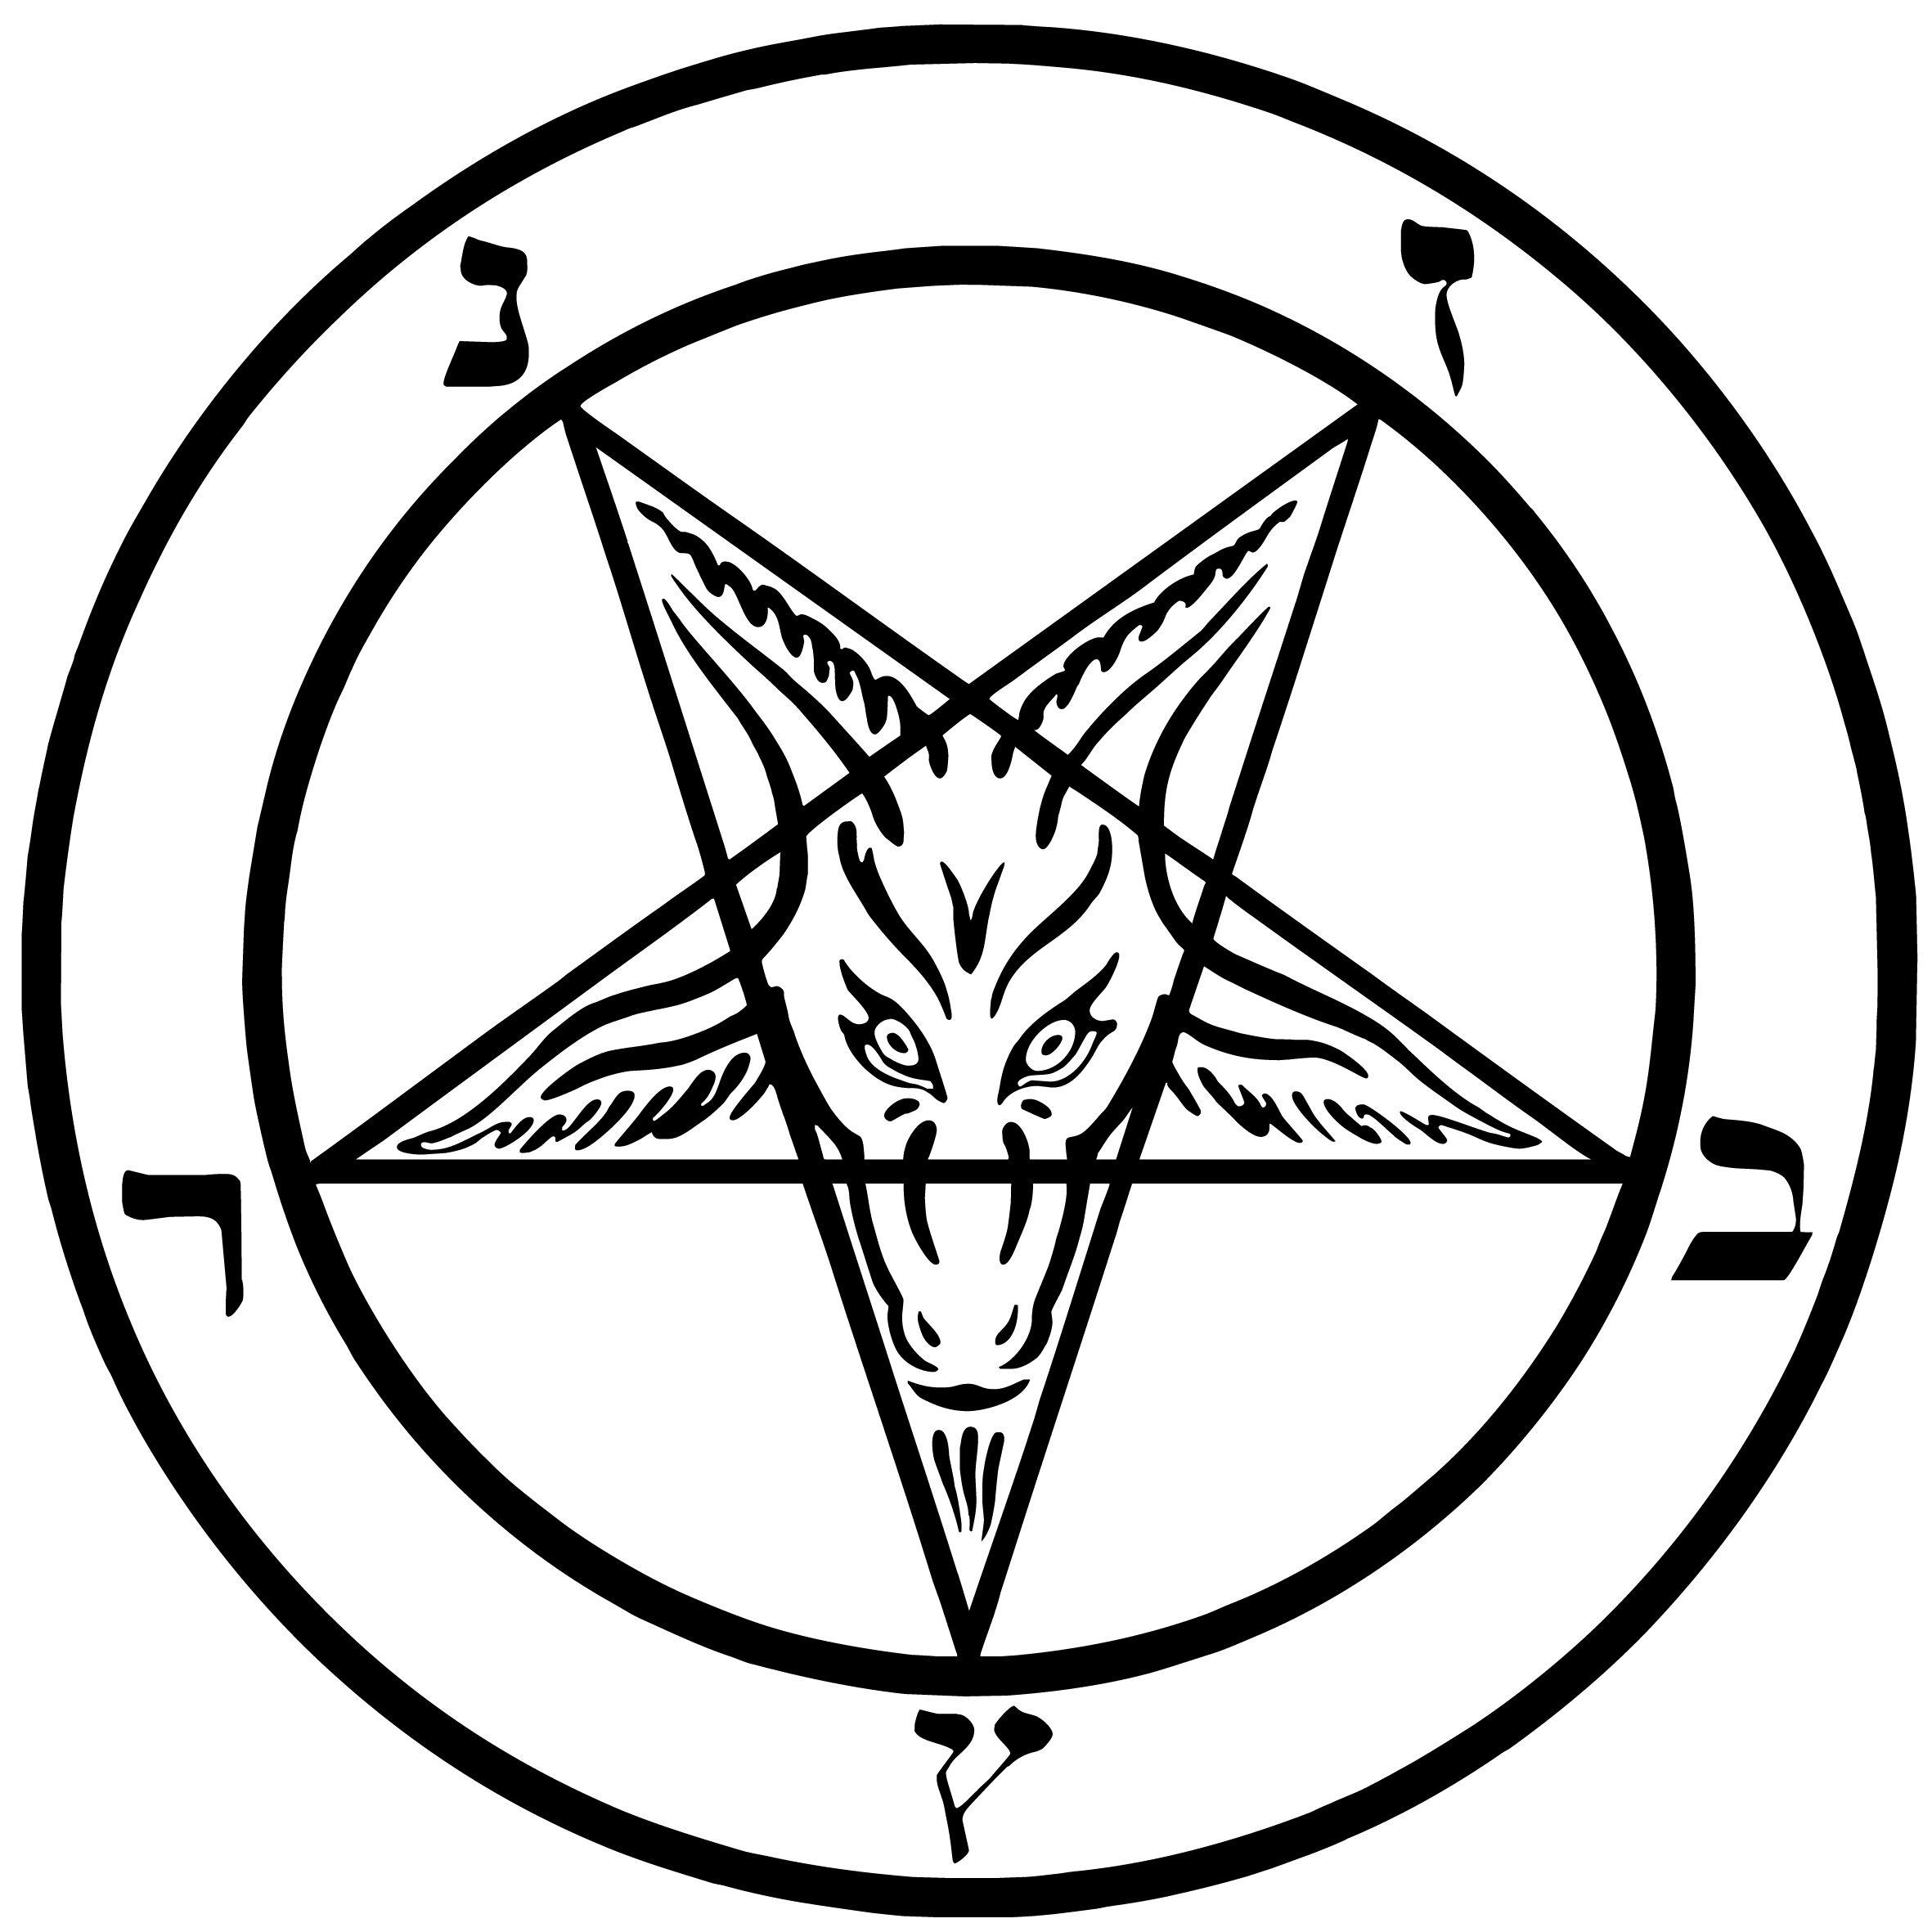 Satanic pentagram google search austin chronicle vice satanic pentagram google search biocorpaavc Choice Image